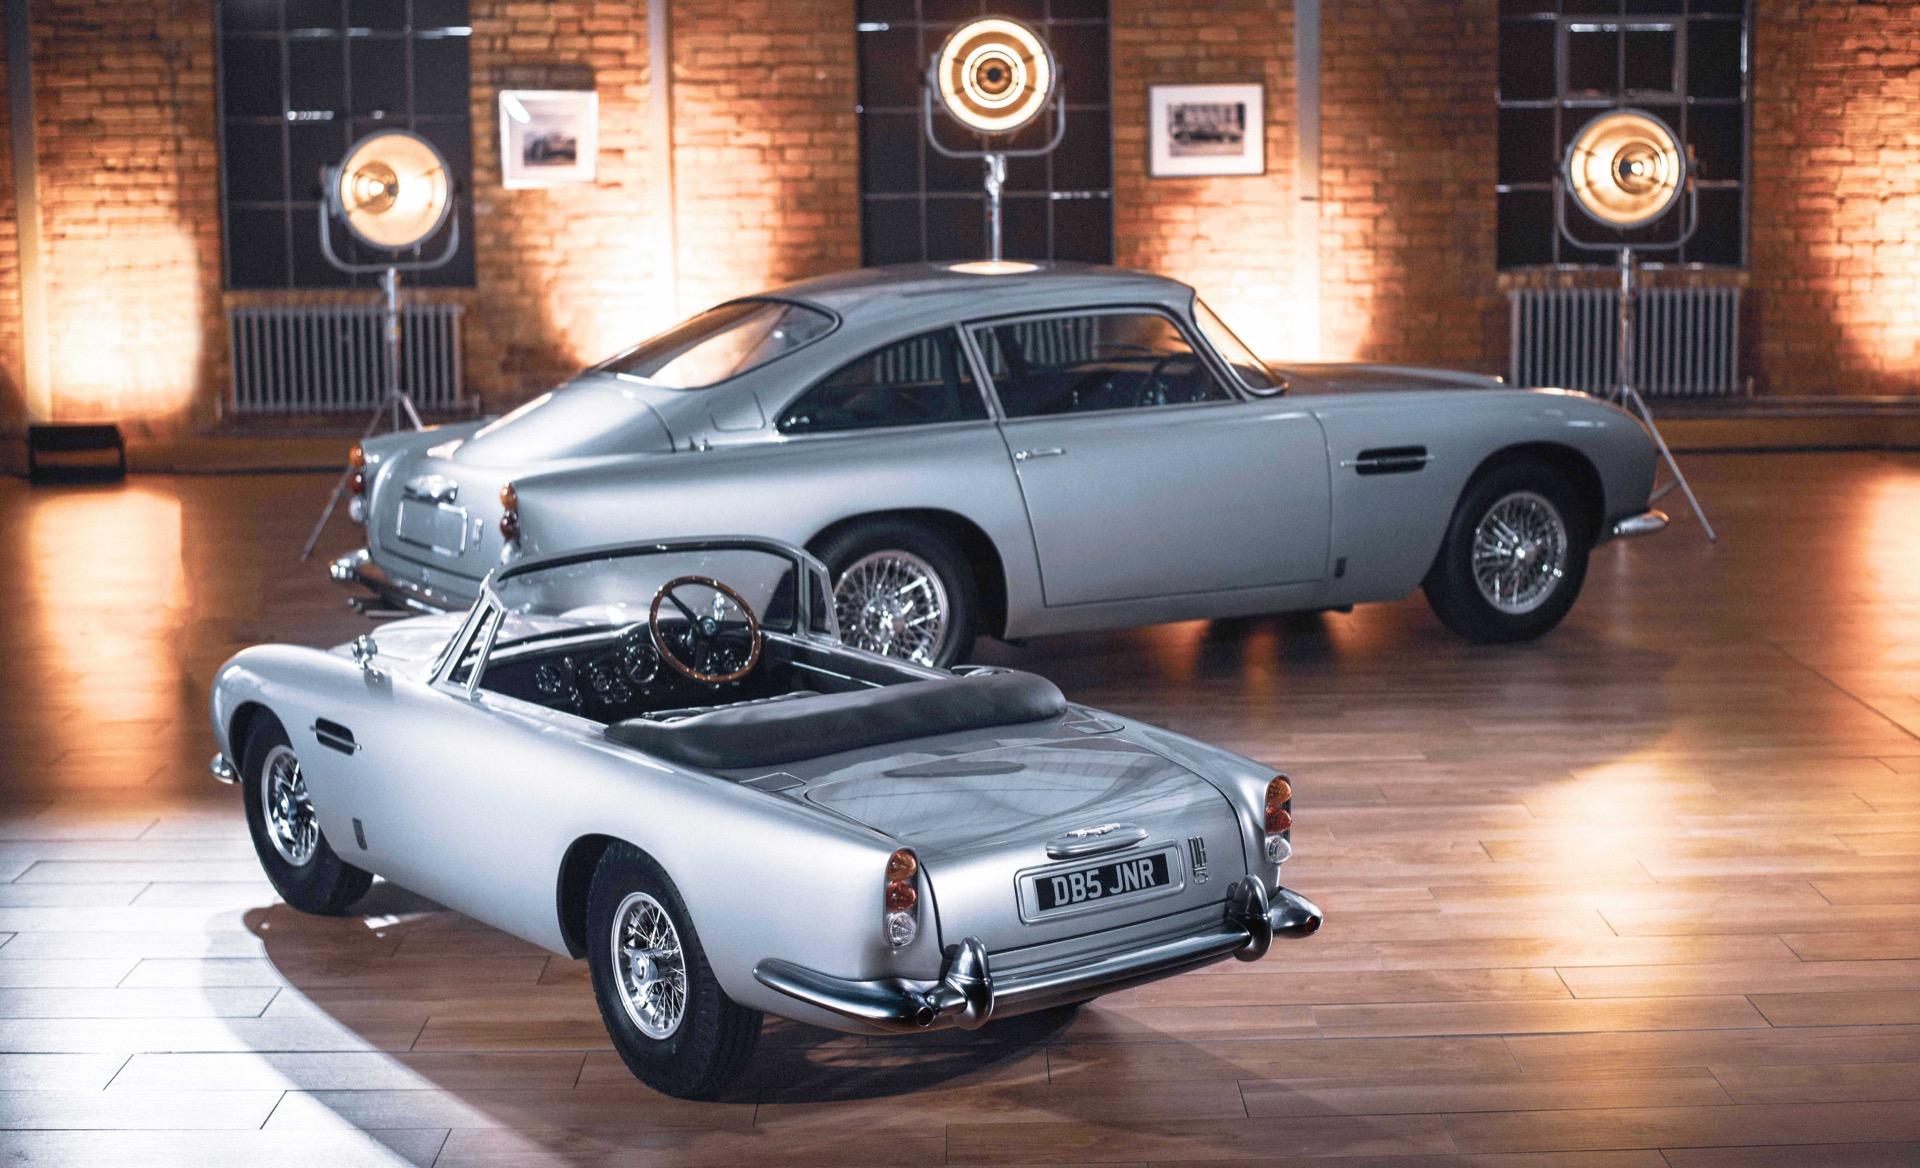 Aston-Martin-DB5-Junior-11